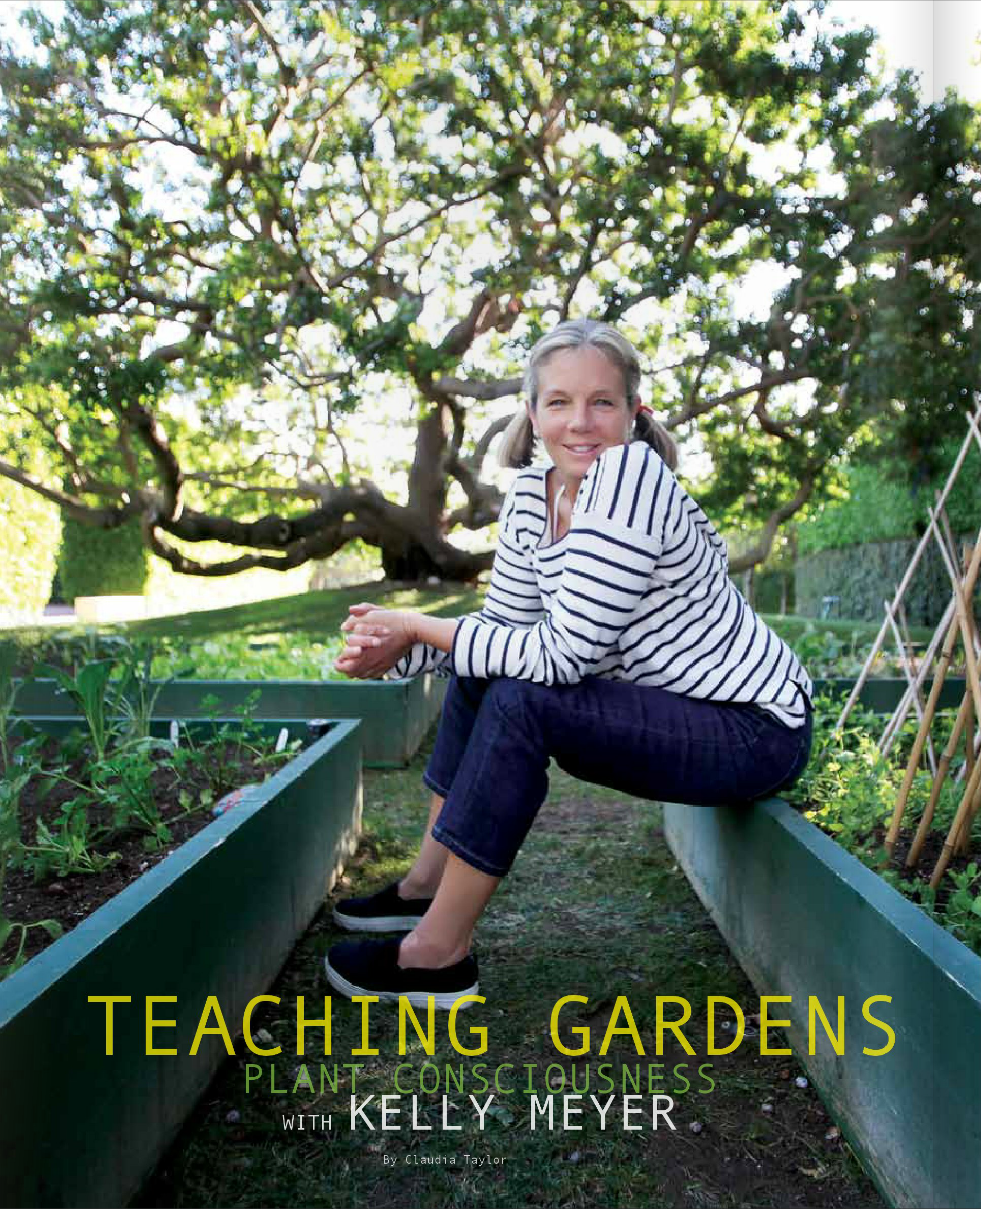 Teaching Gardens p 1.png